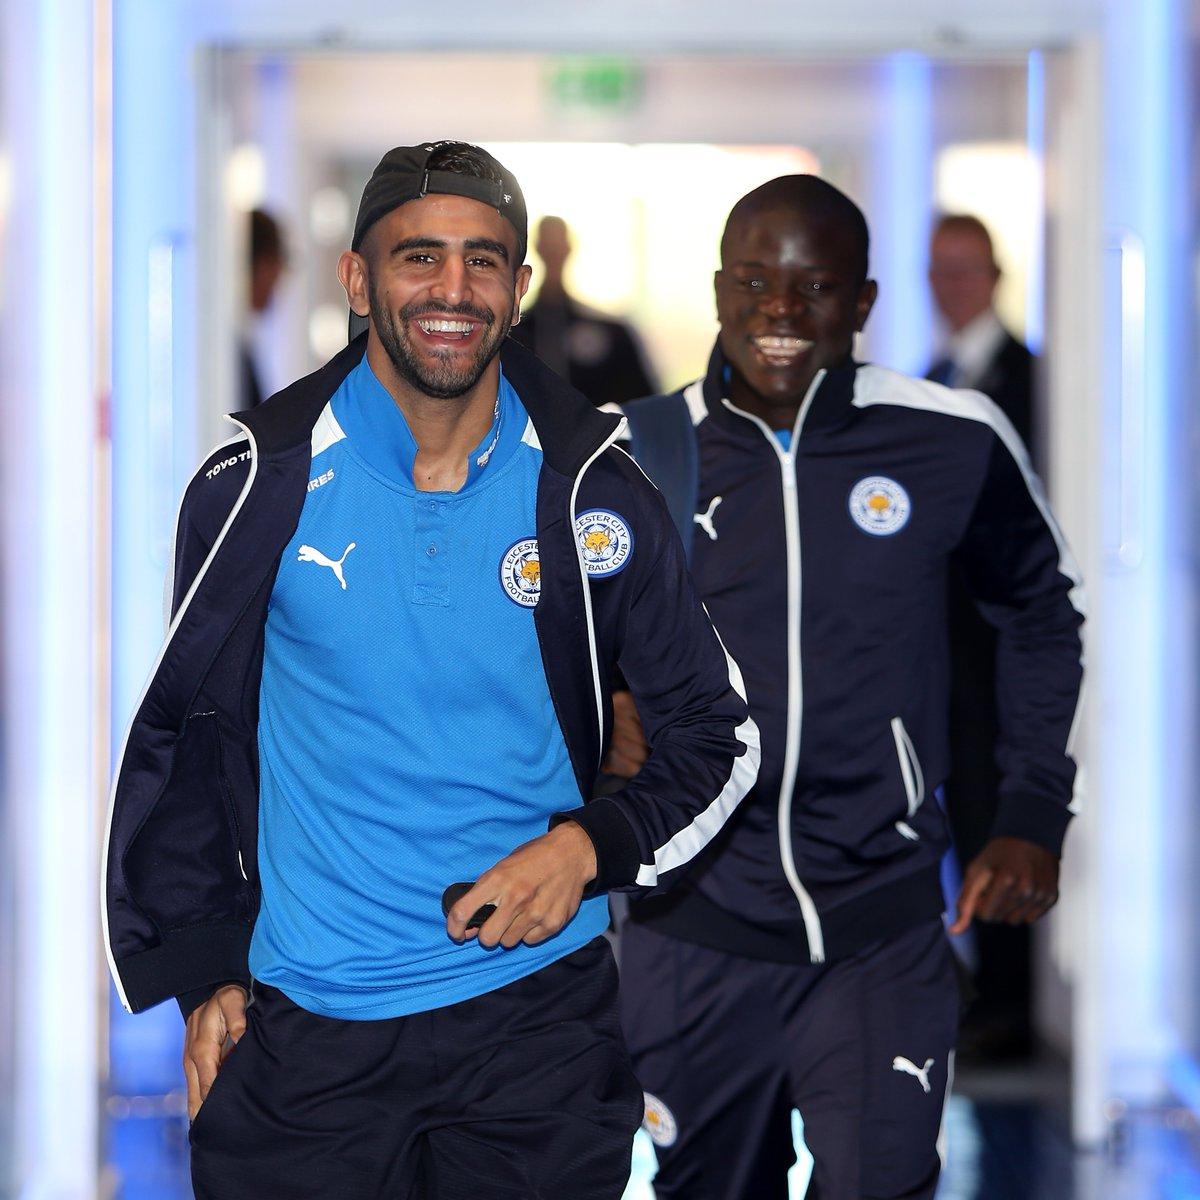 Friends reunited in the #UCLfinal 🔜  Riyad Mahrez & N'Golo Kanté 😀  #UCL https://t.co/7nthBoefOu